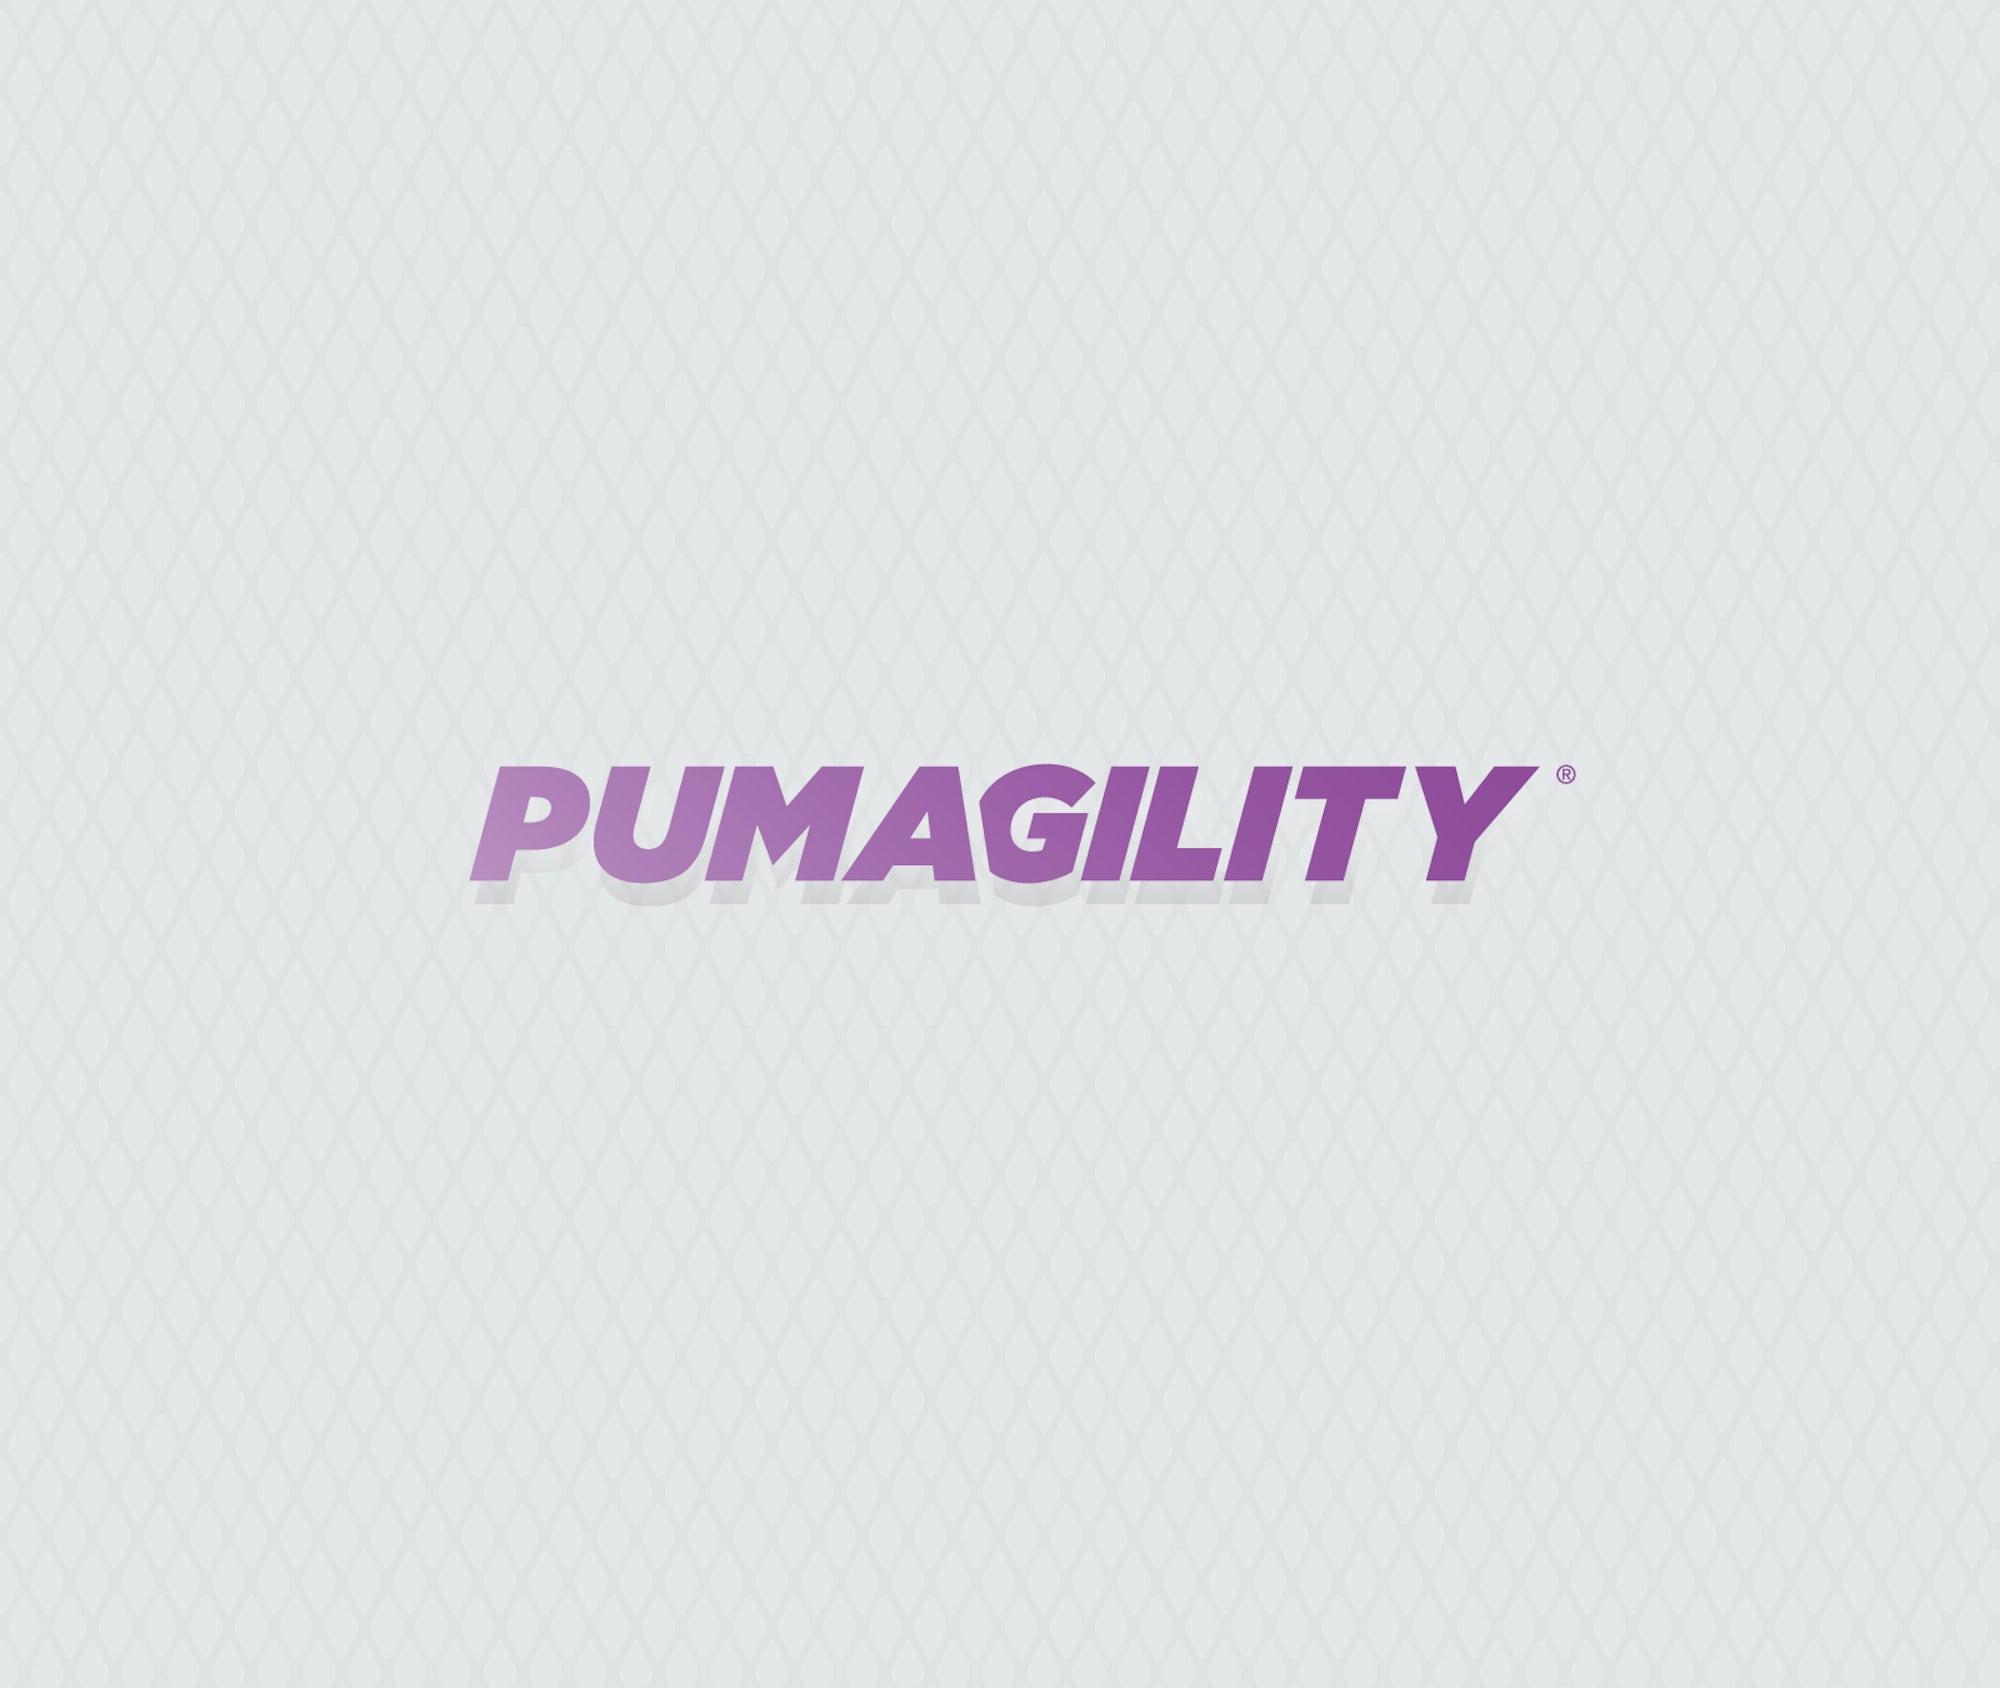 PUMA Branding and Ad Campaign Design